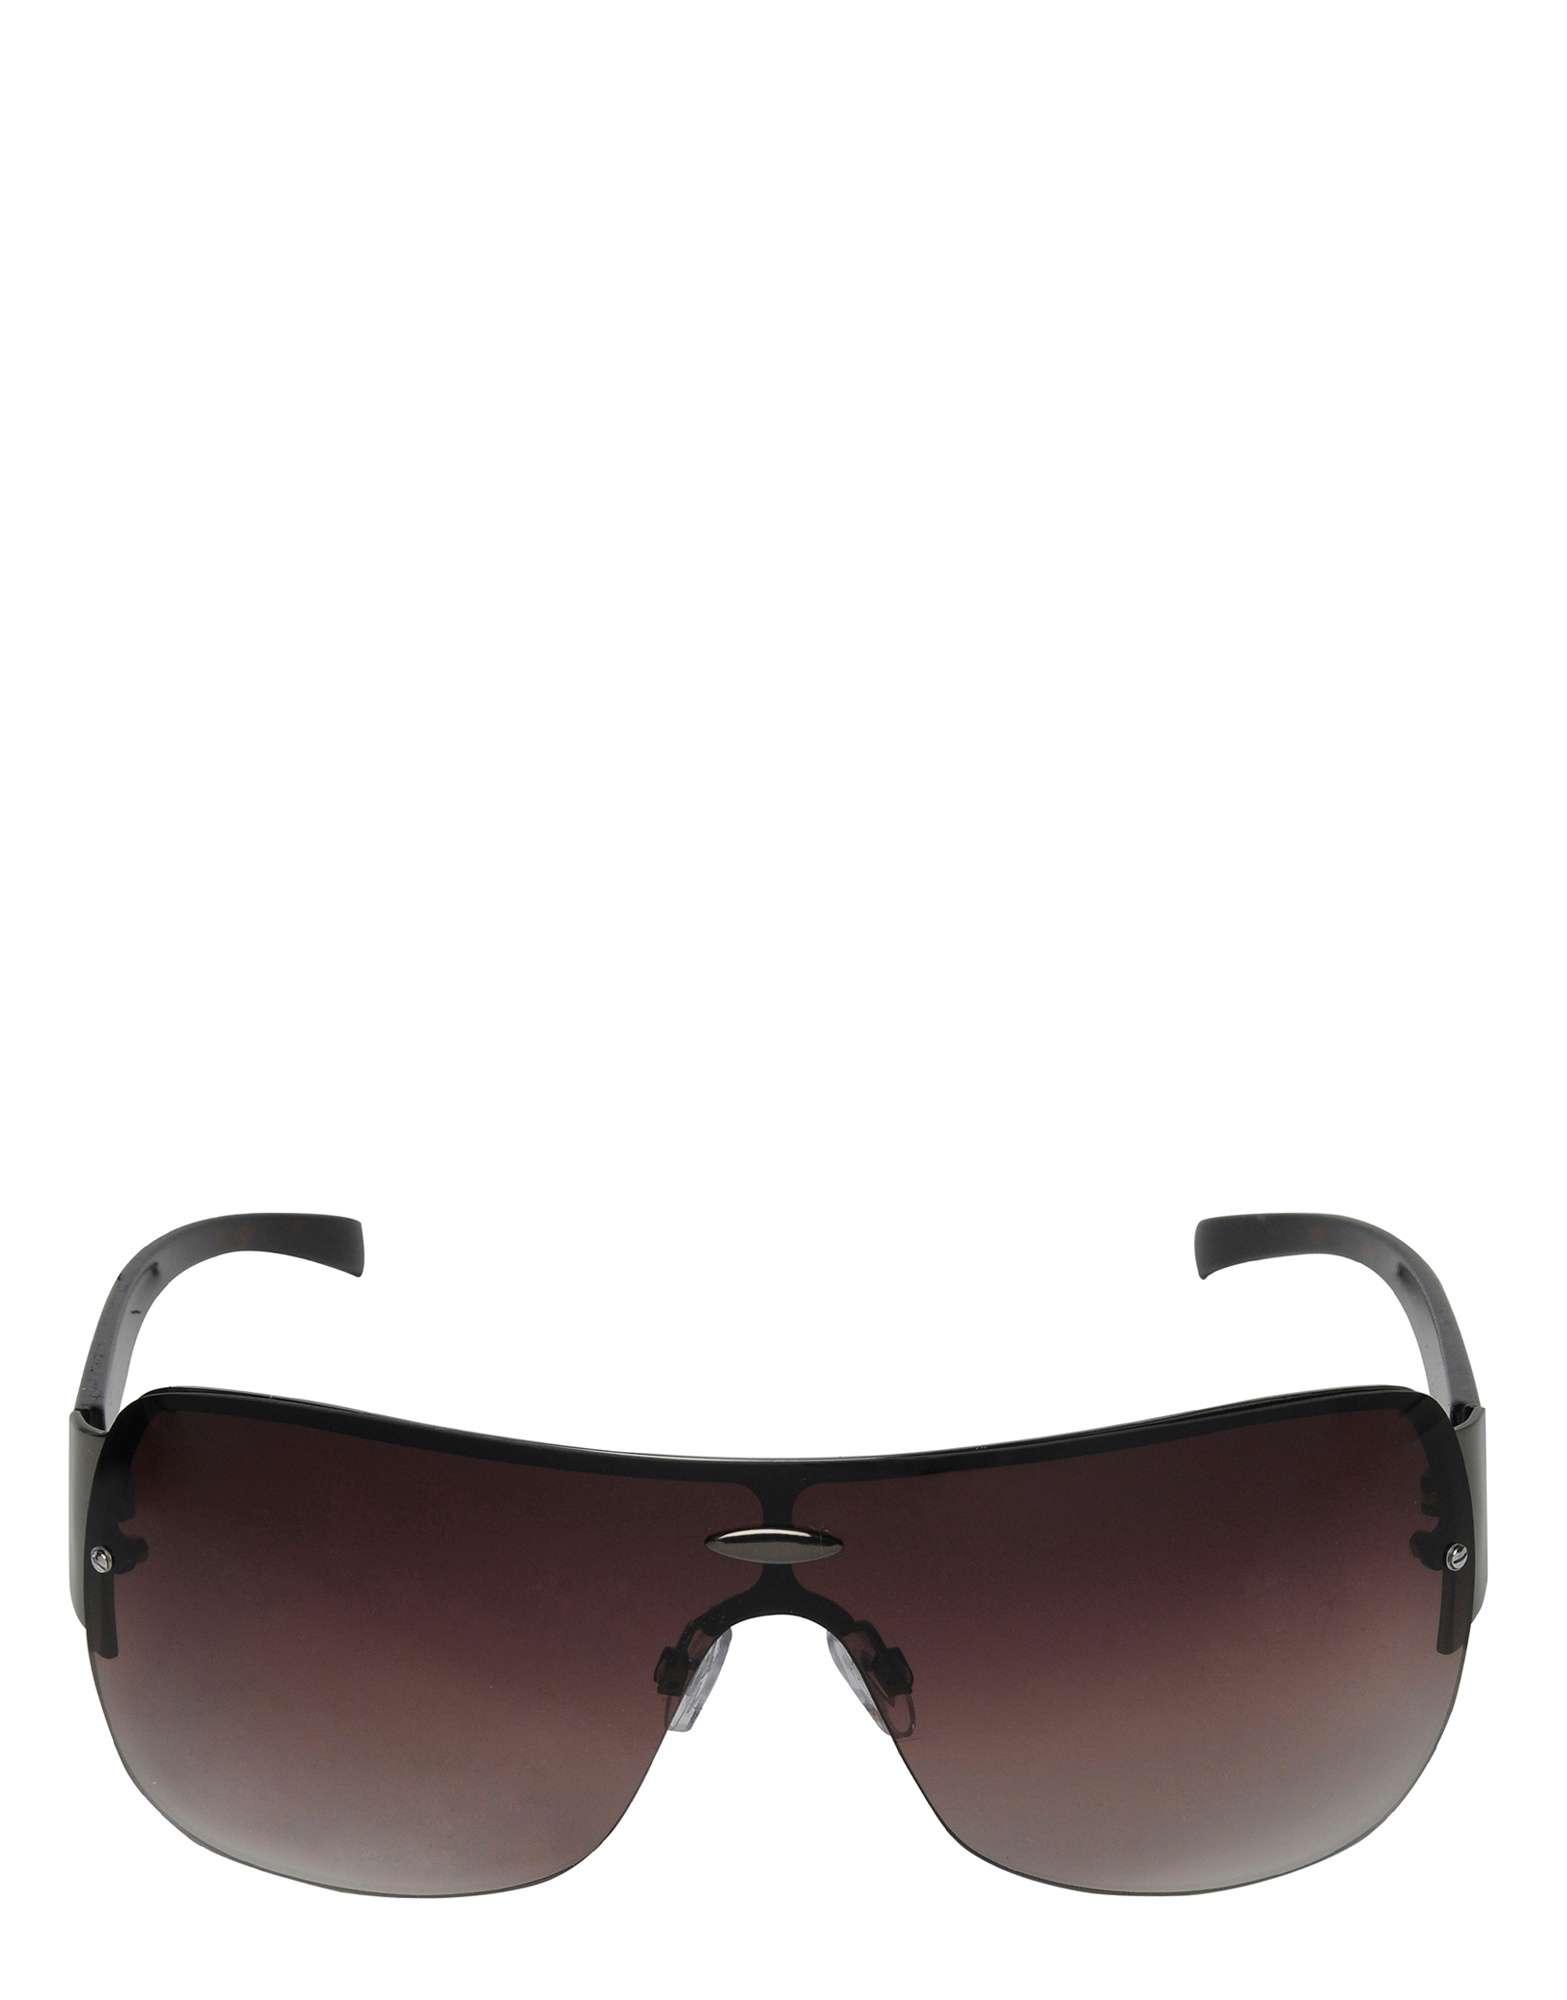 Brookhaven Chloe Sunglasses